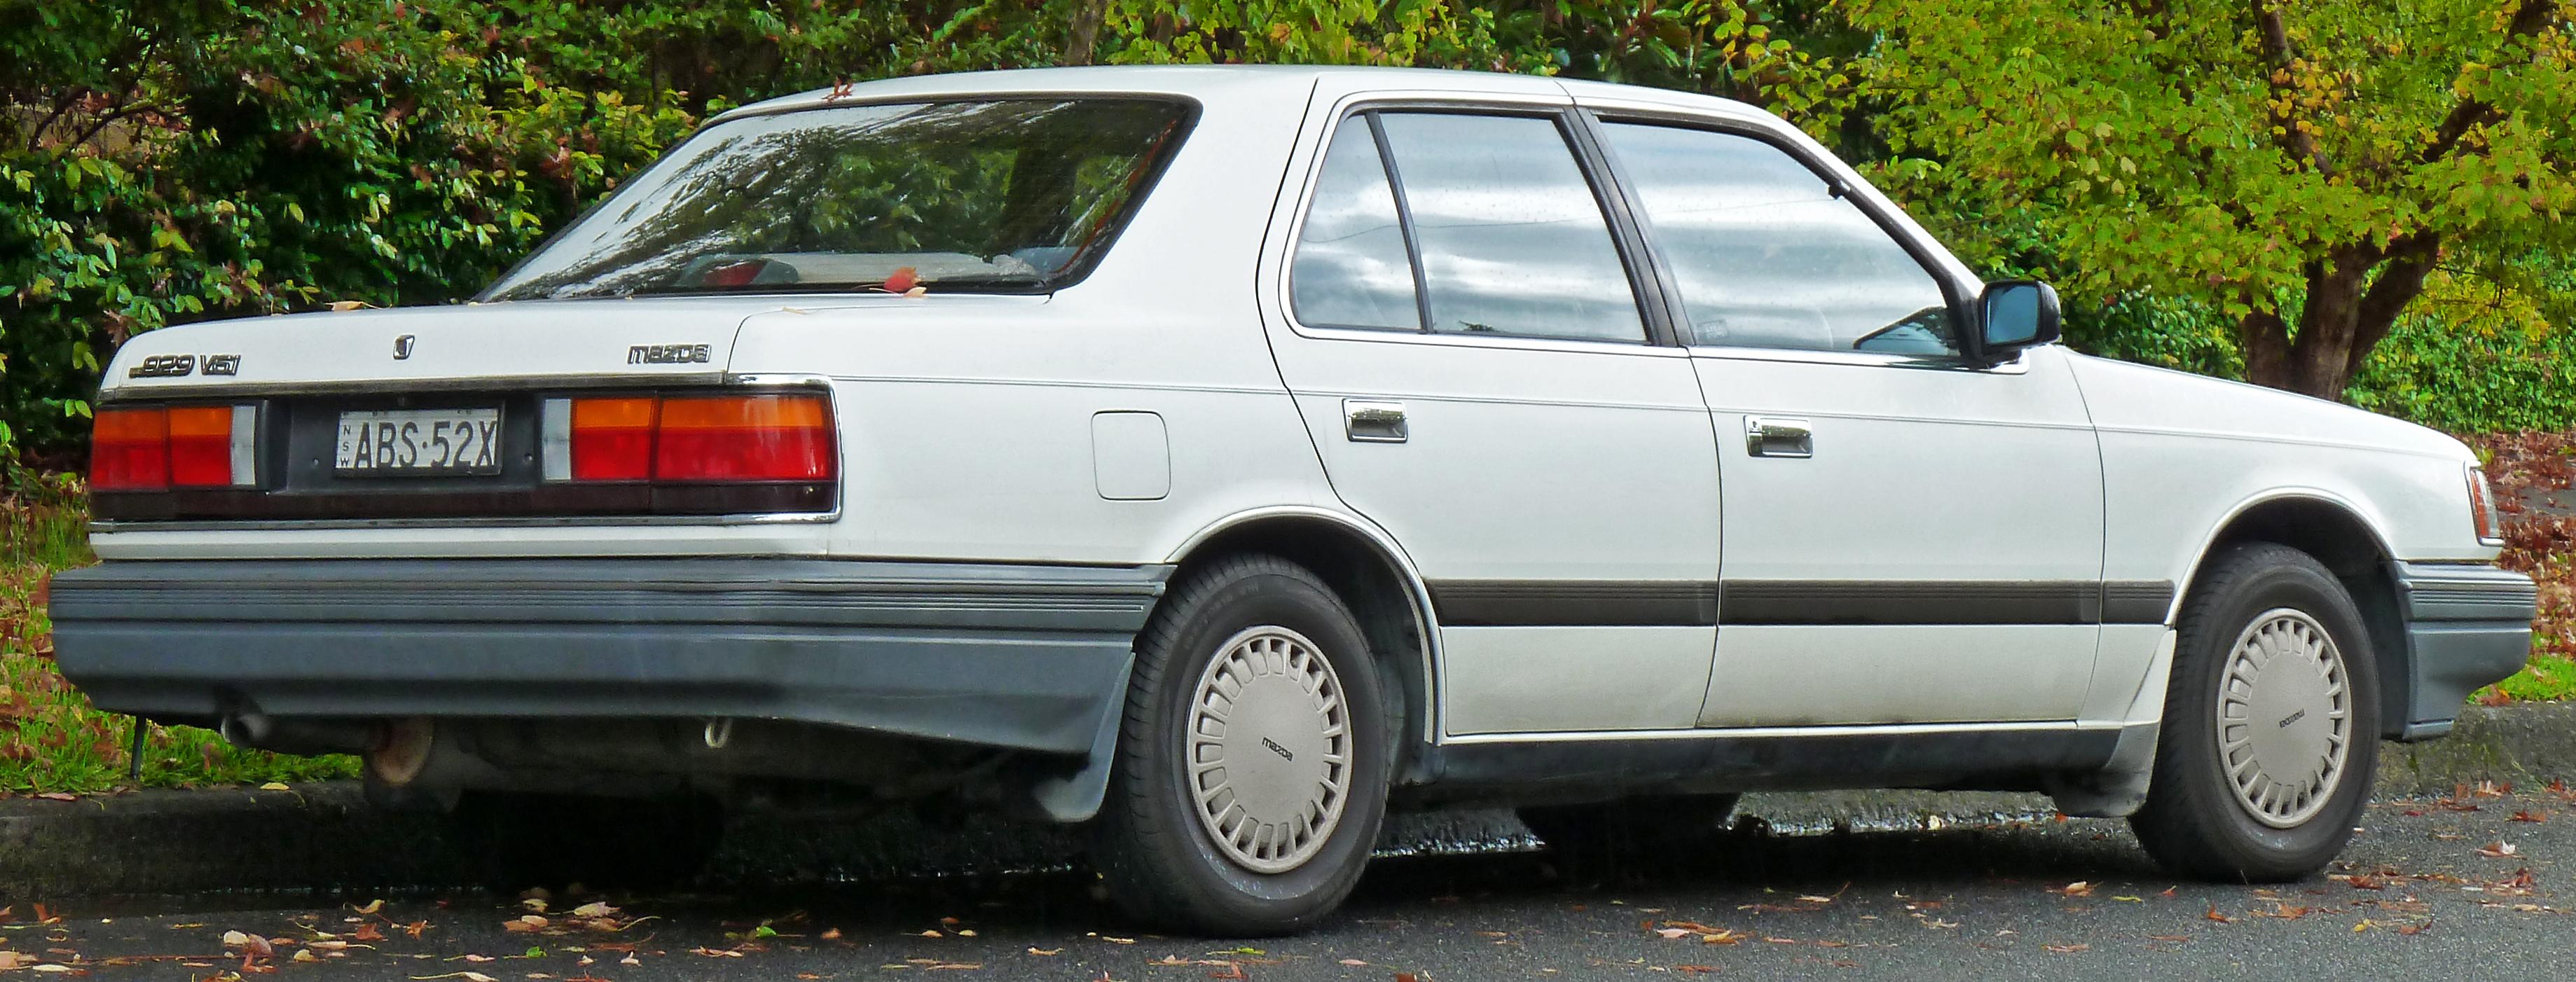 File 1987 1989 Mazda 929 Hc Sedan 2011 04 28 02 Jpg